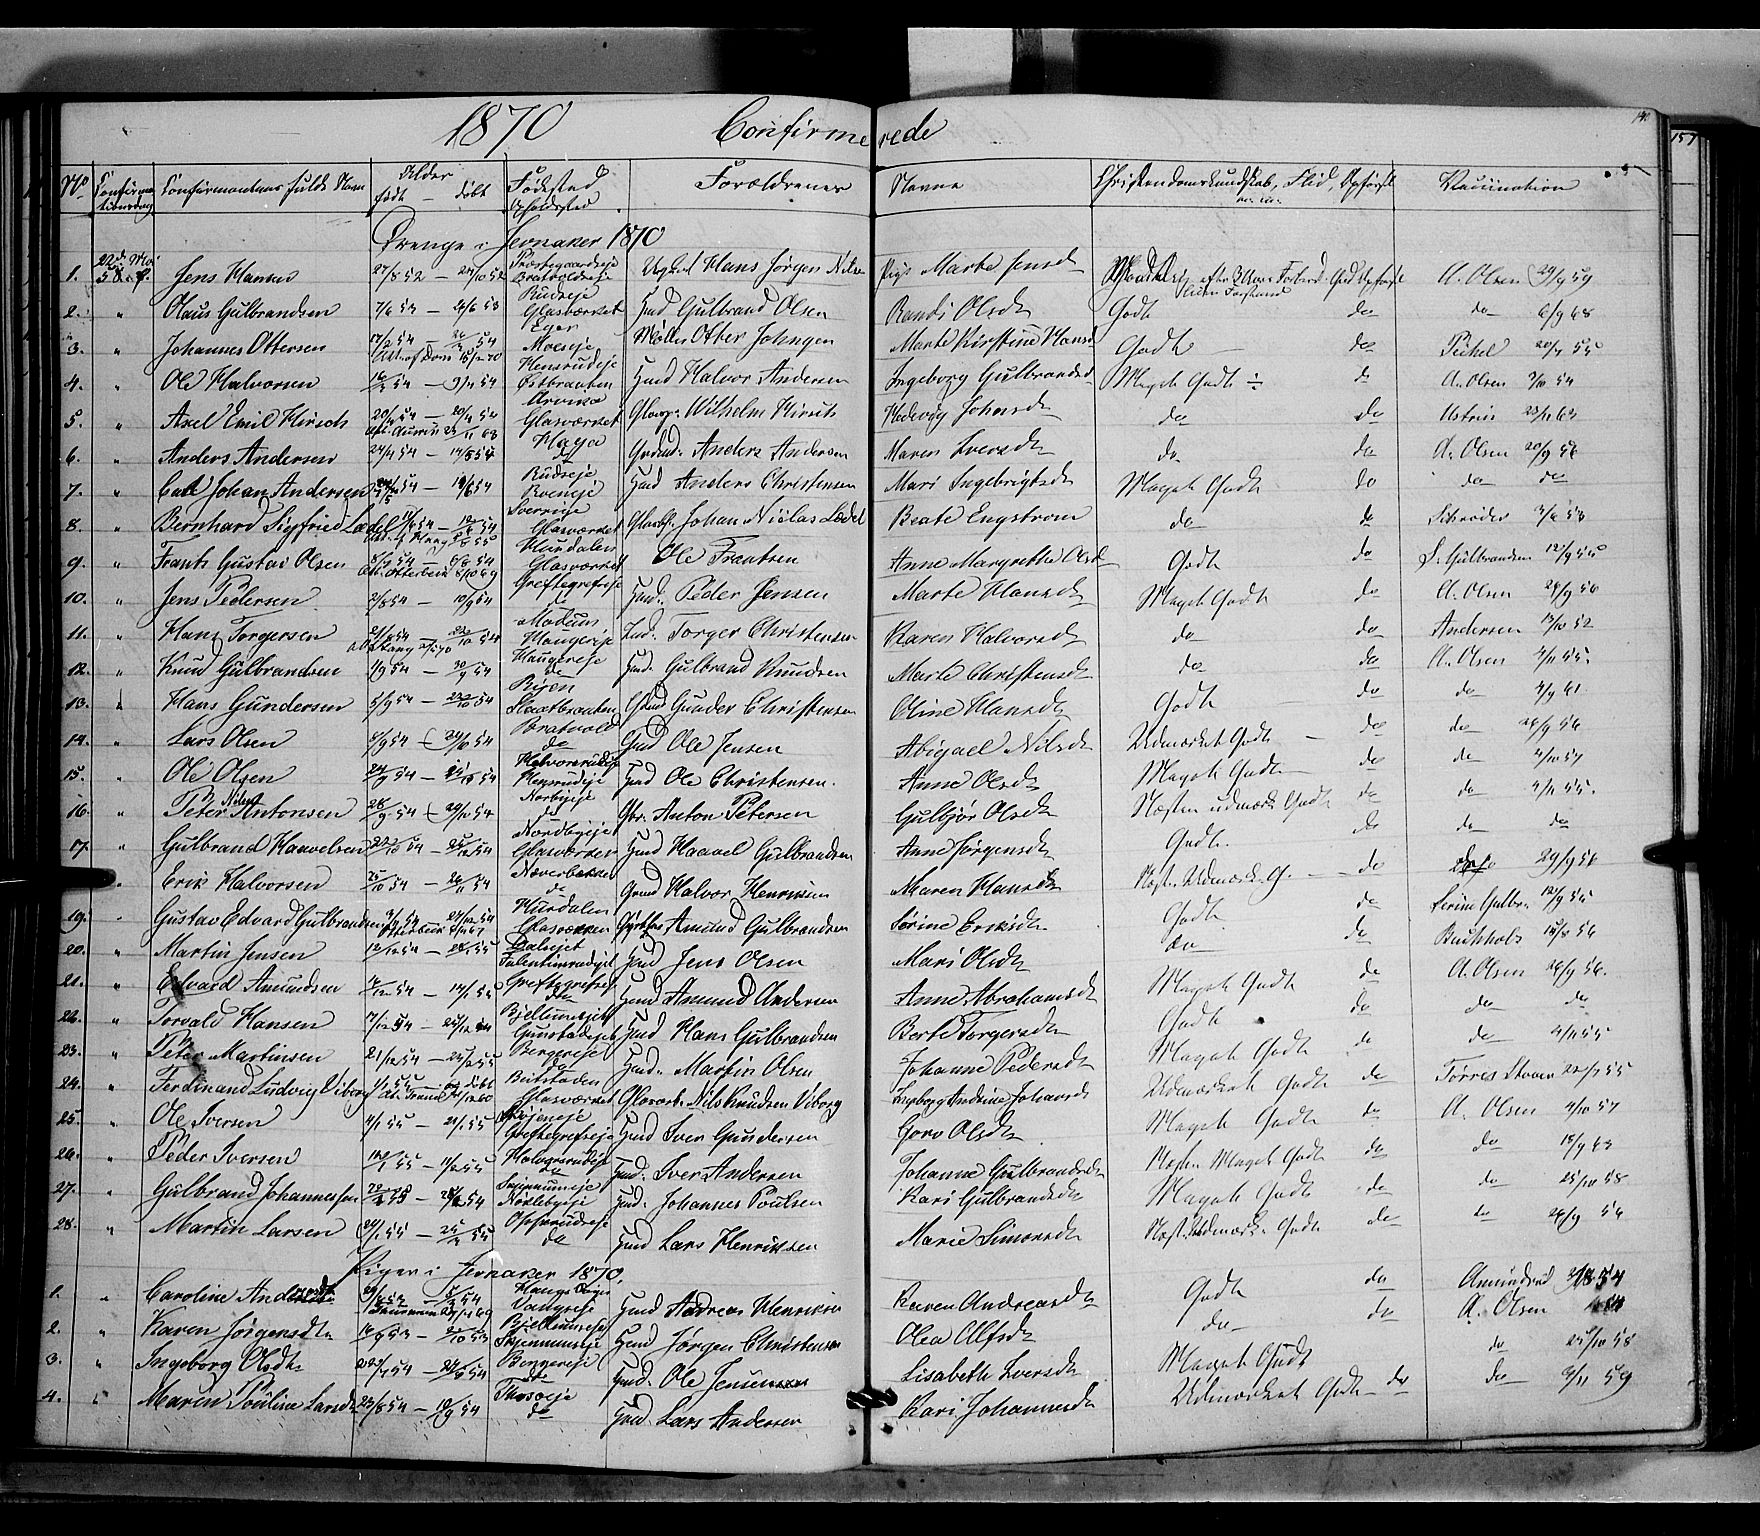 SAH, Jevnaker prestekontor, Ministerialbok nr. 7, 1858-1876, s. 140